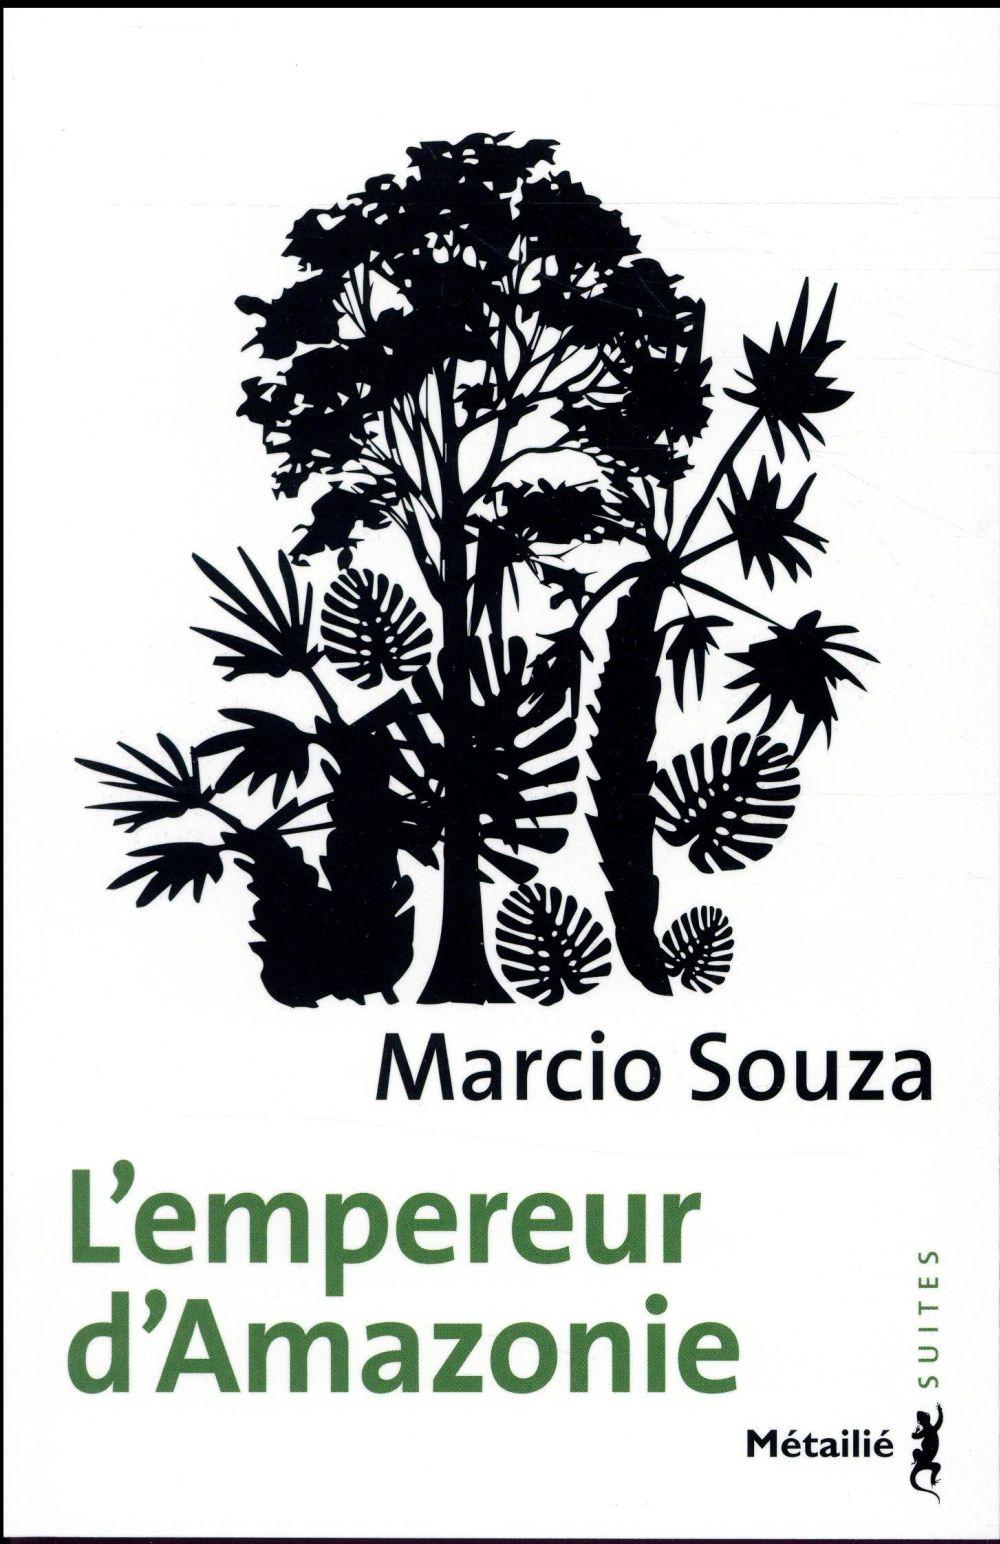 L'EMPEREUR D'AMAZONIE